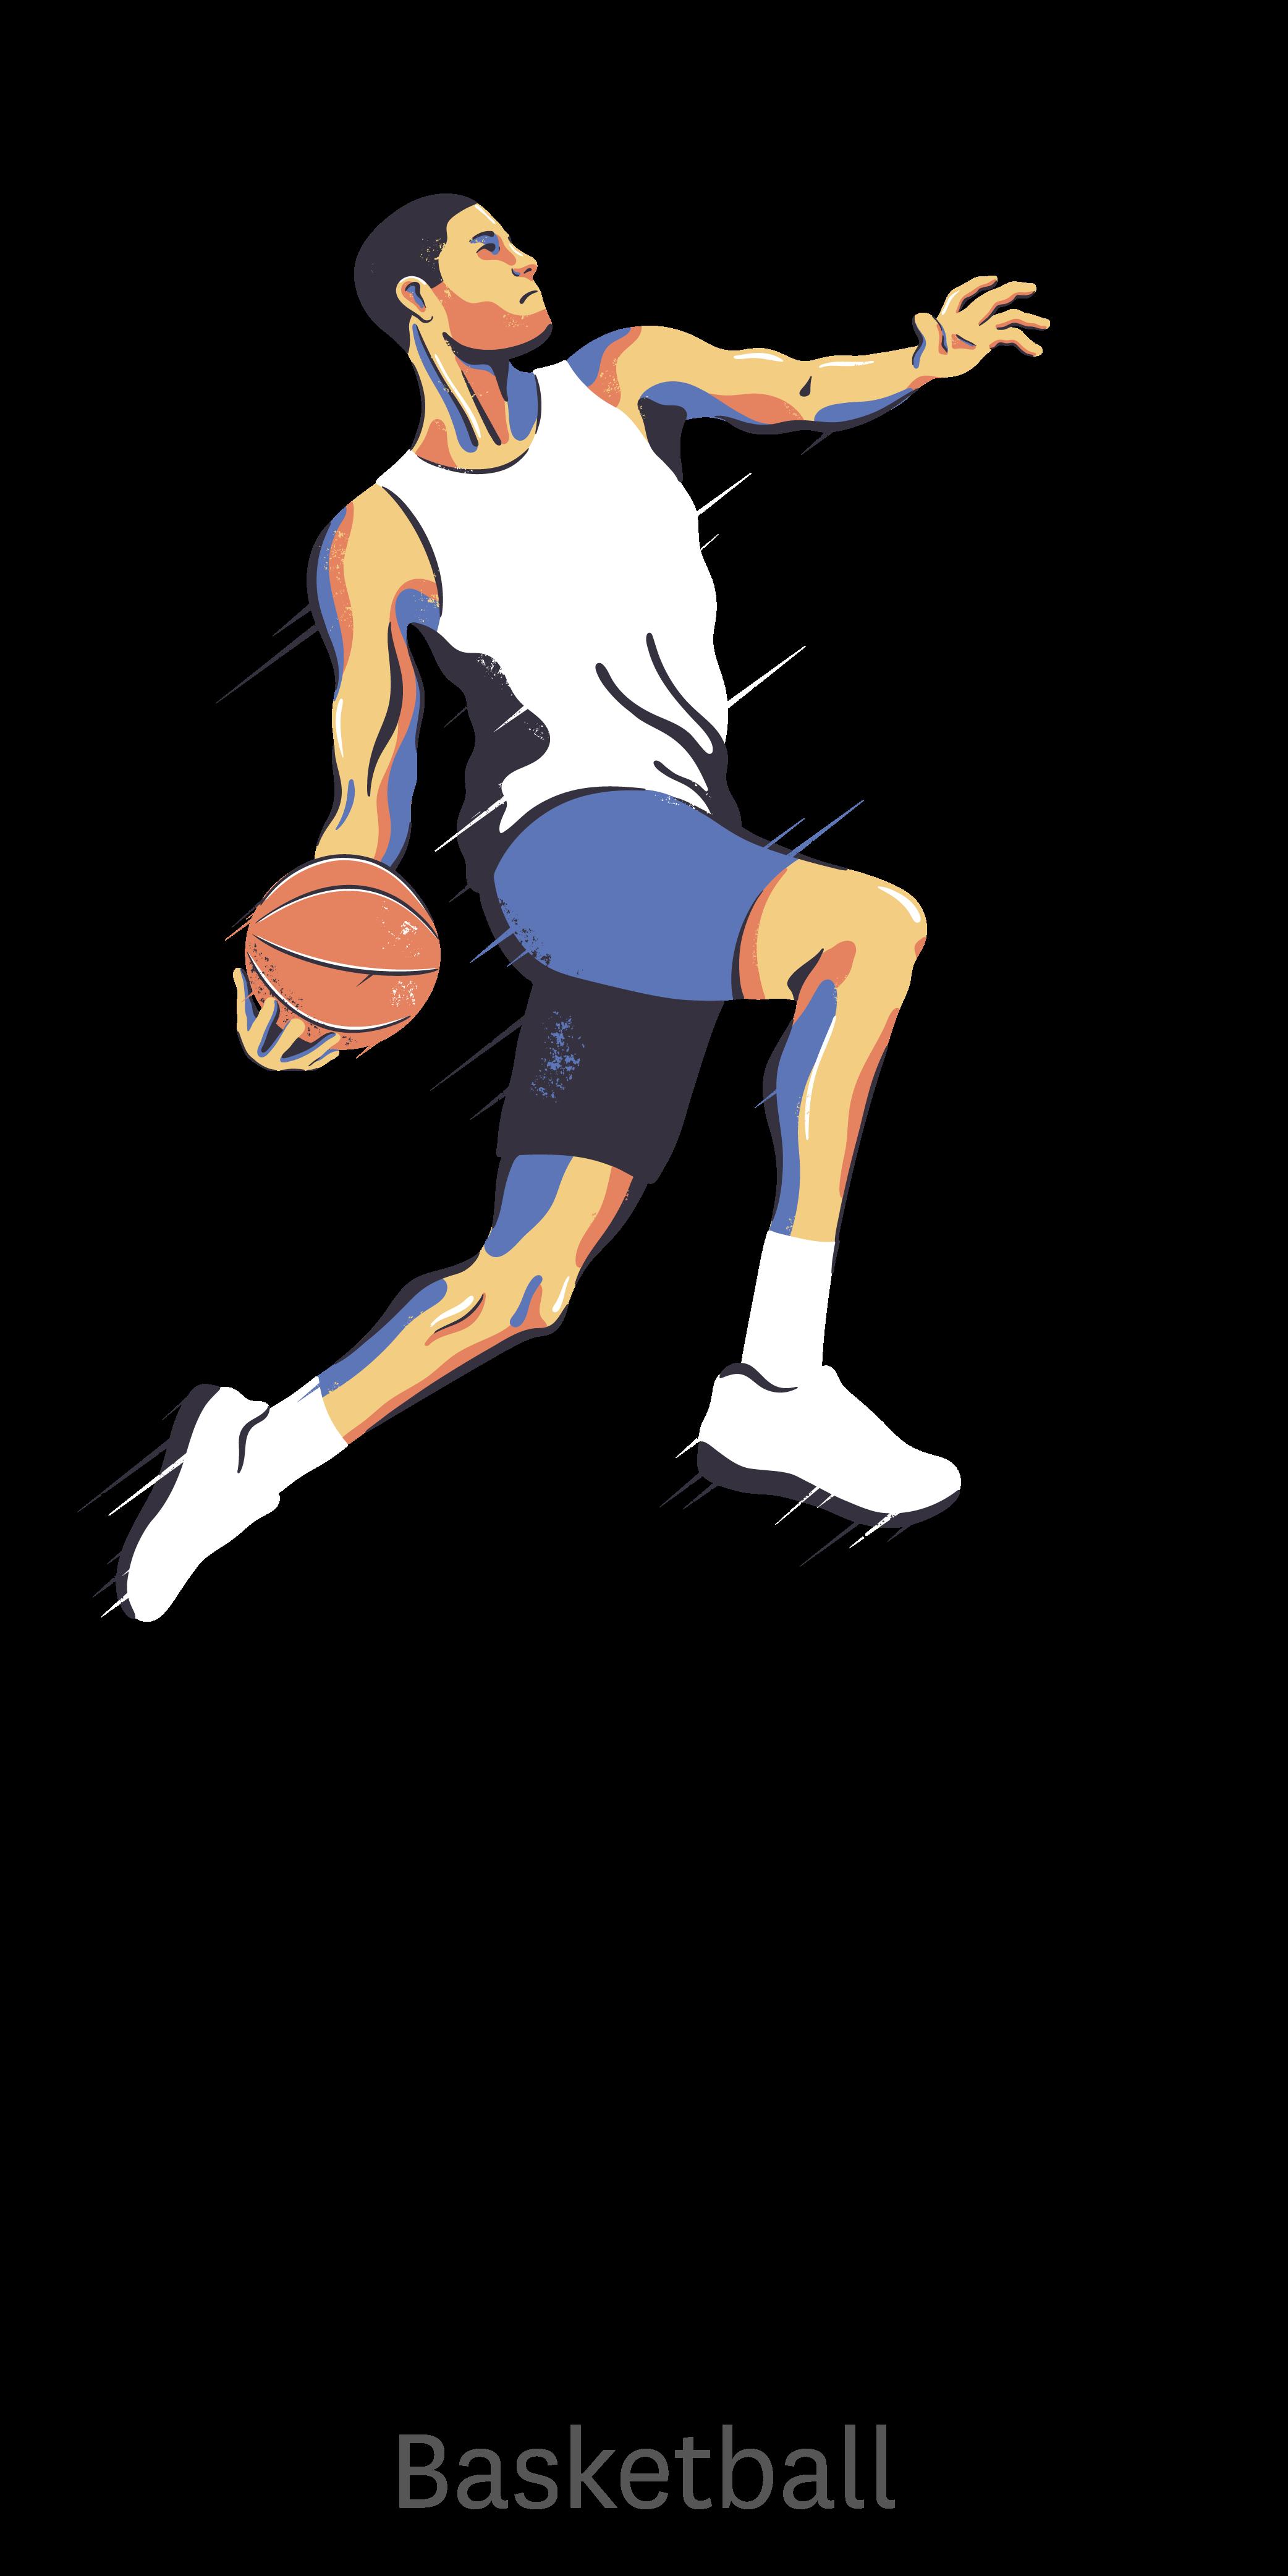 movement_sport_basketball.png